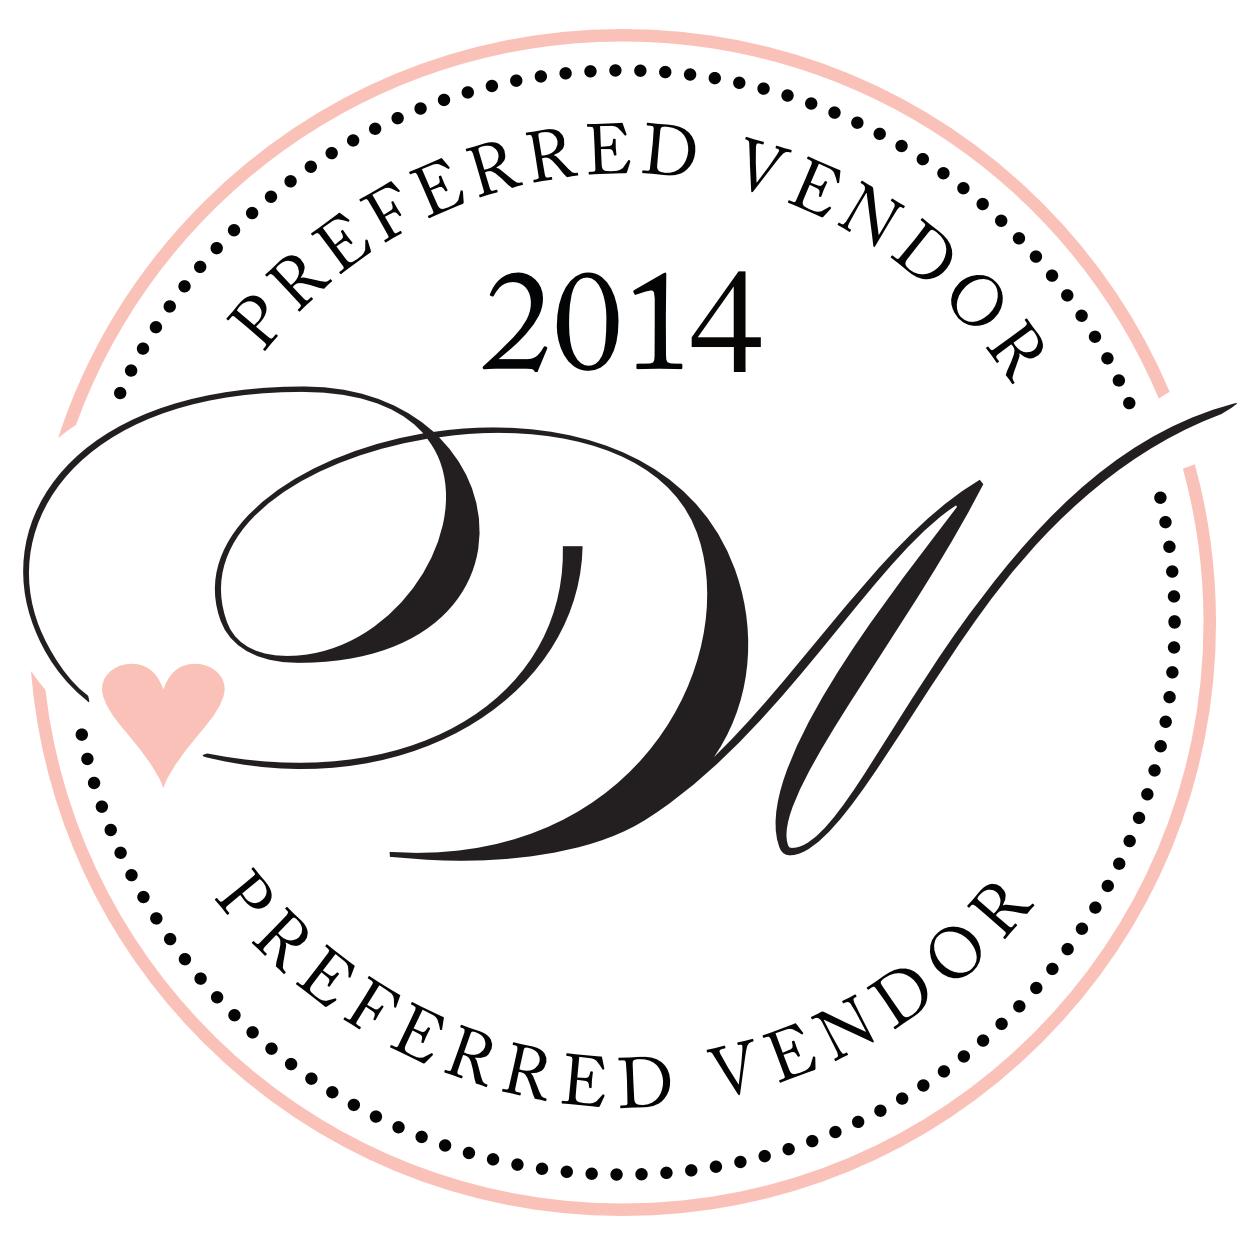 Preferred-Vendor-Badge-Final2014.png